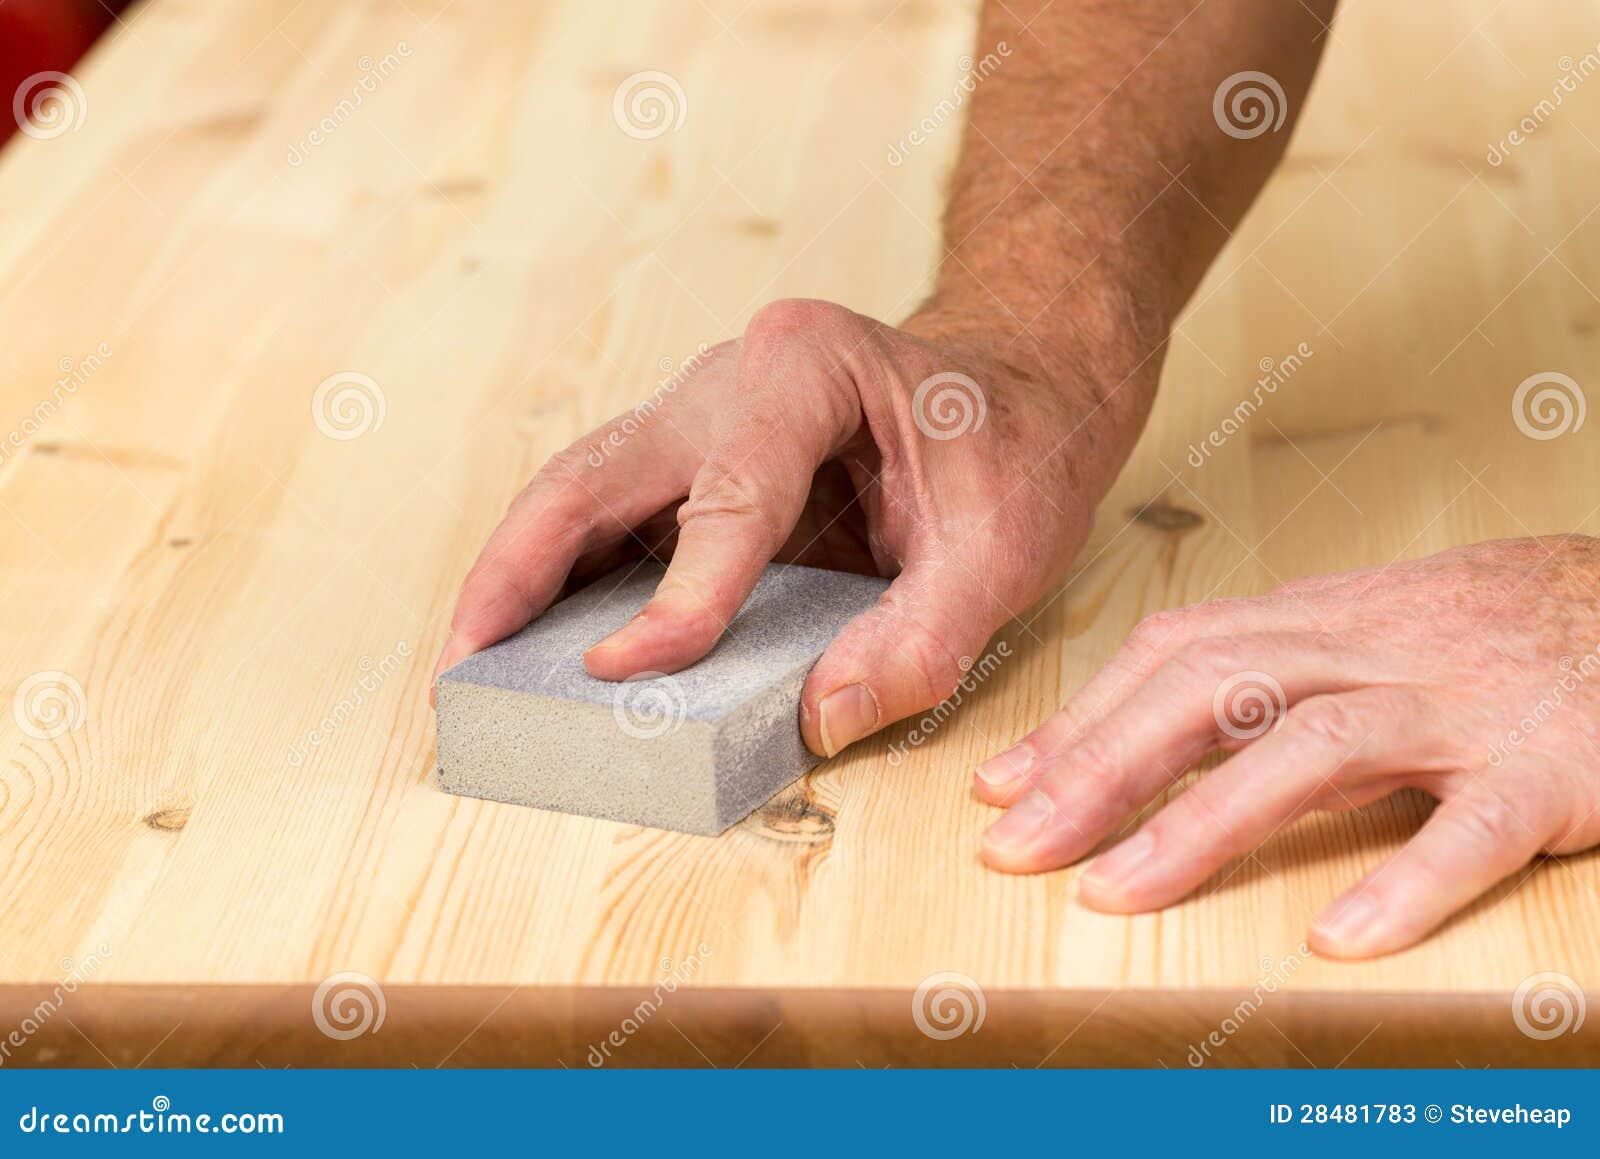 Mans Hand On Sanding Block Pine Wood Stock Photos